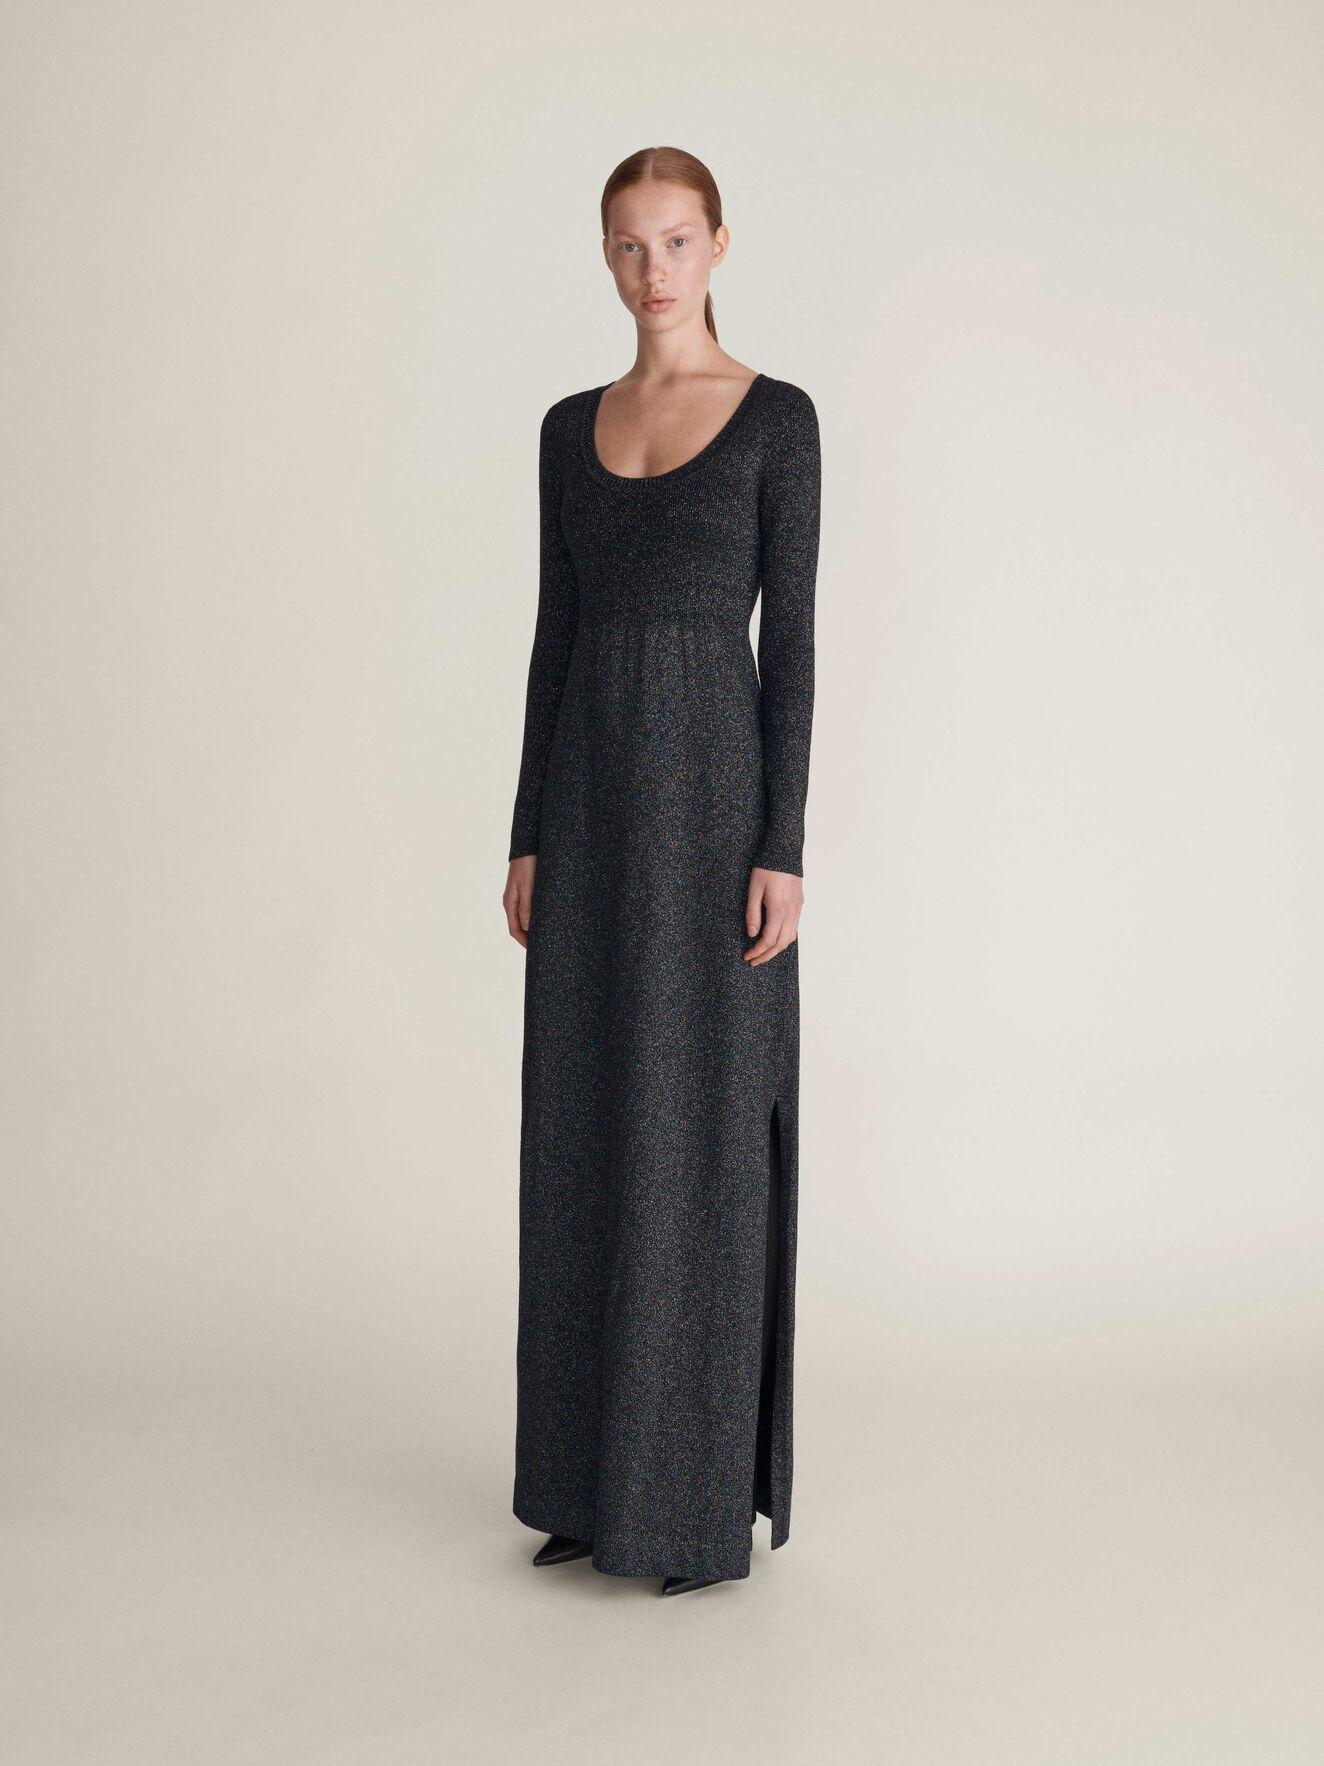 Crux Kleid in Midnight Black from Tiger of Sweden